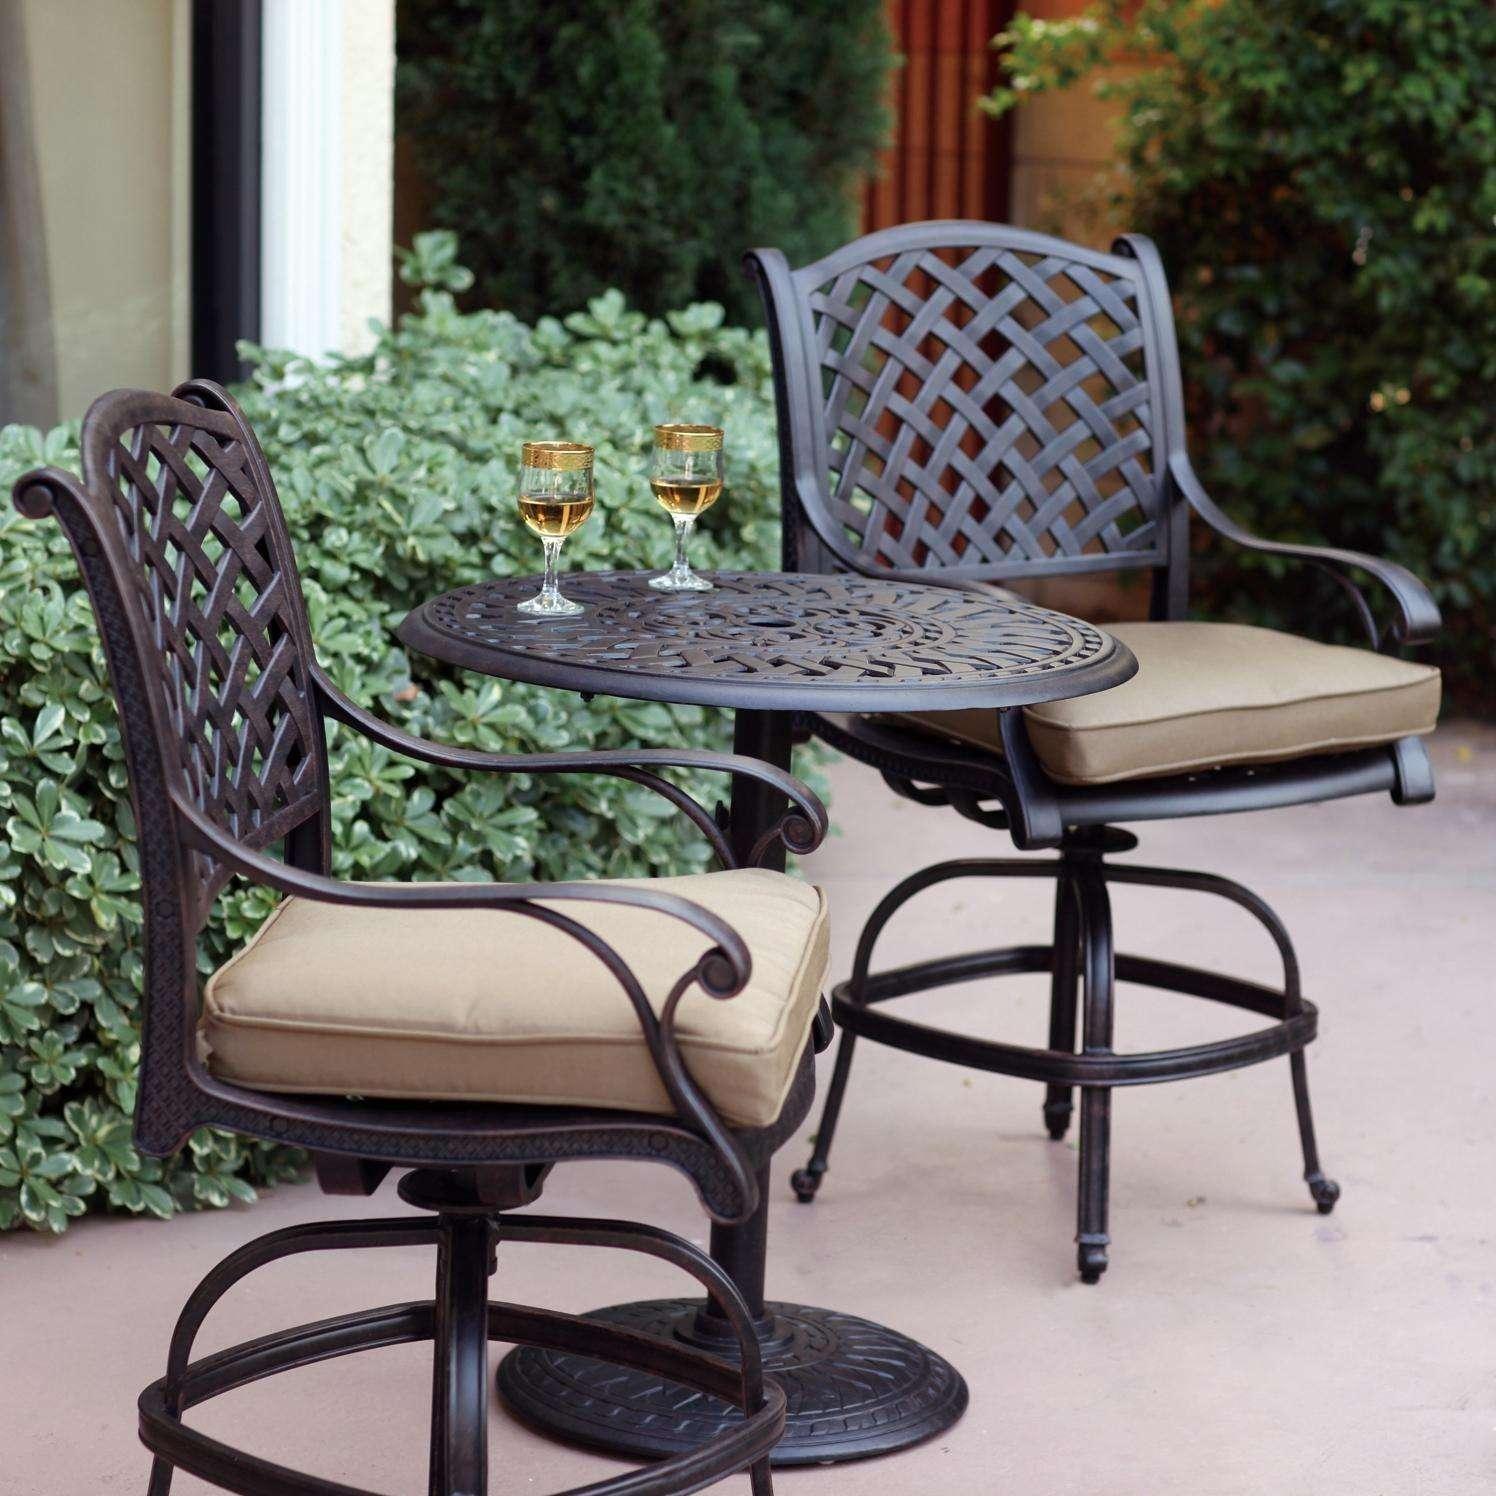 darlee nassau 3 piece cast aluminum patio counter height bar set with swivel bar stools